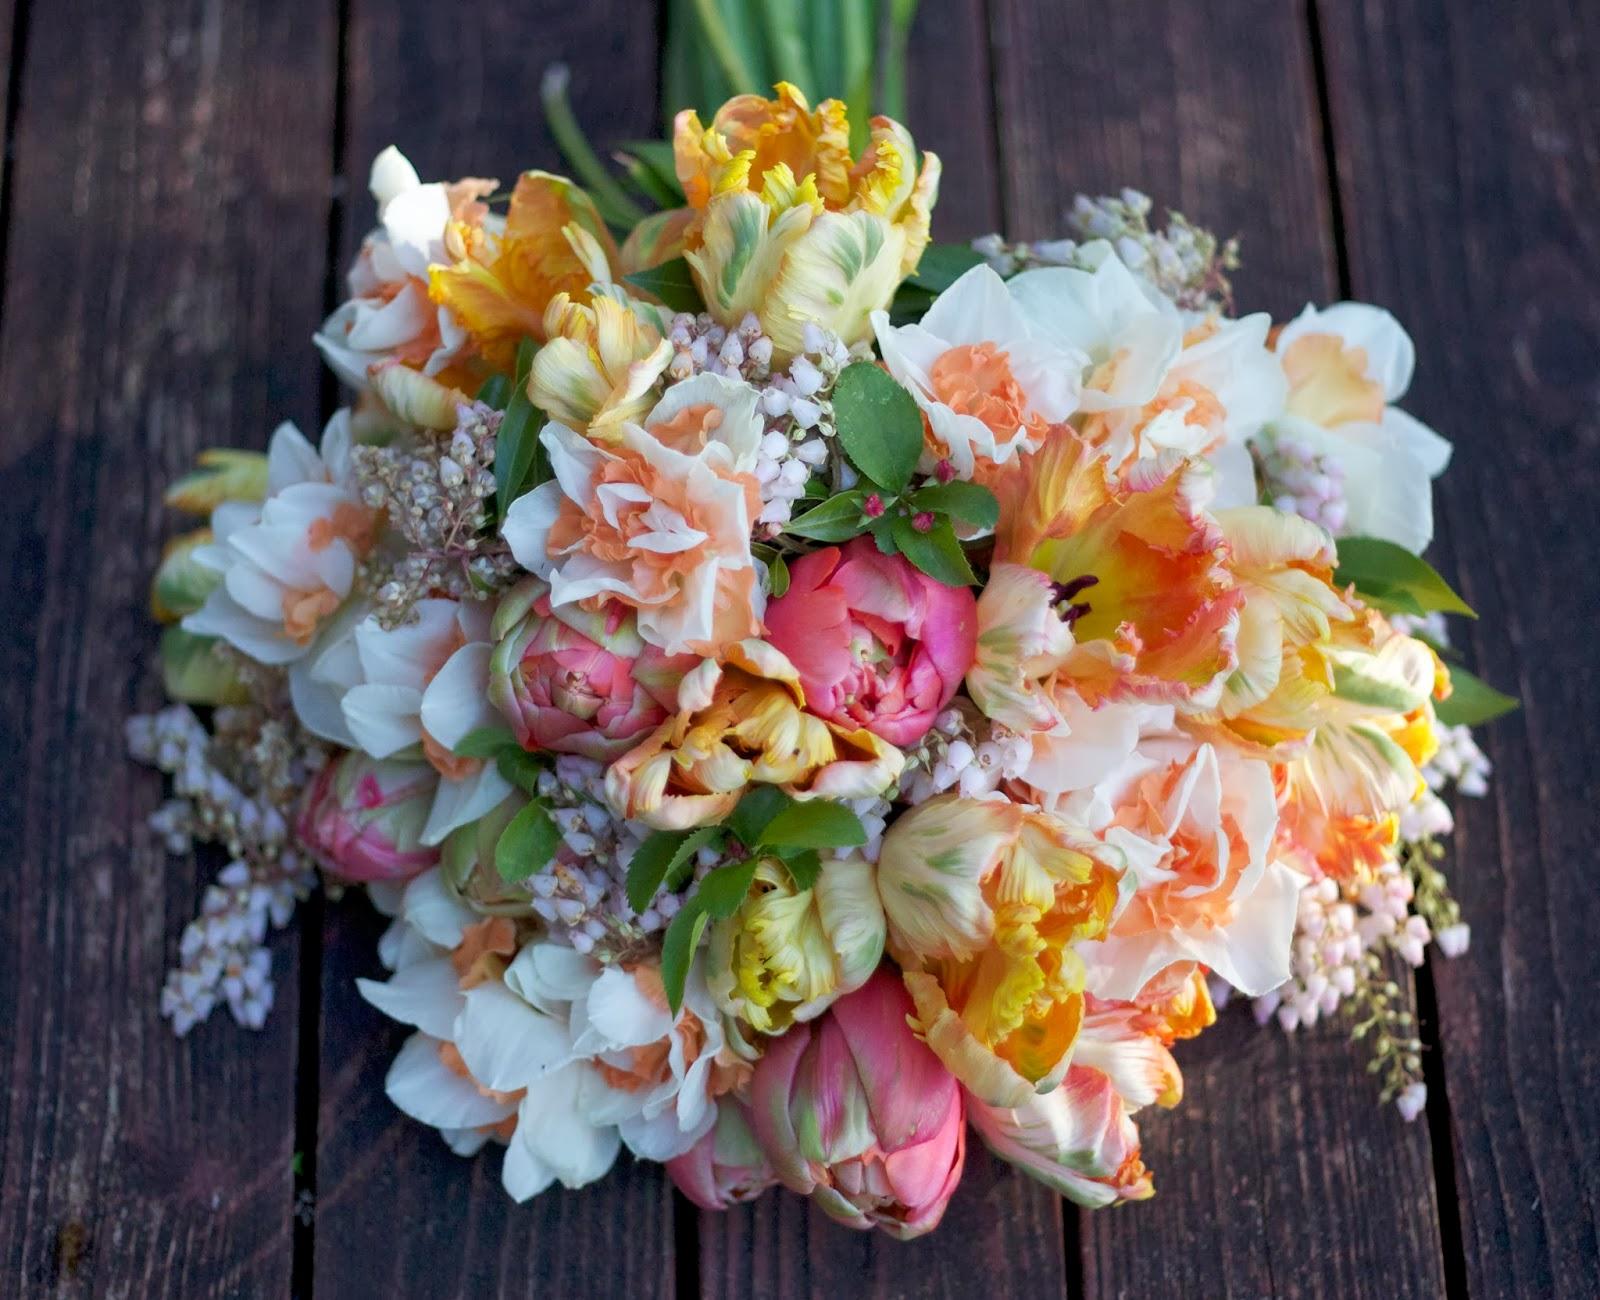 bella fiori designs flowers for weddings in washington seattle everett. Black Bedroom Furniture Sets. Home Design Ideas